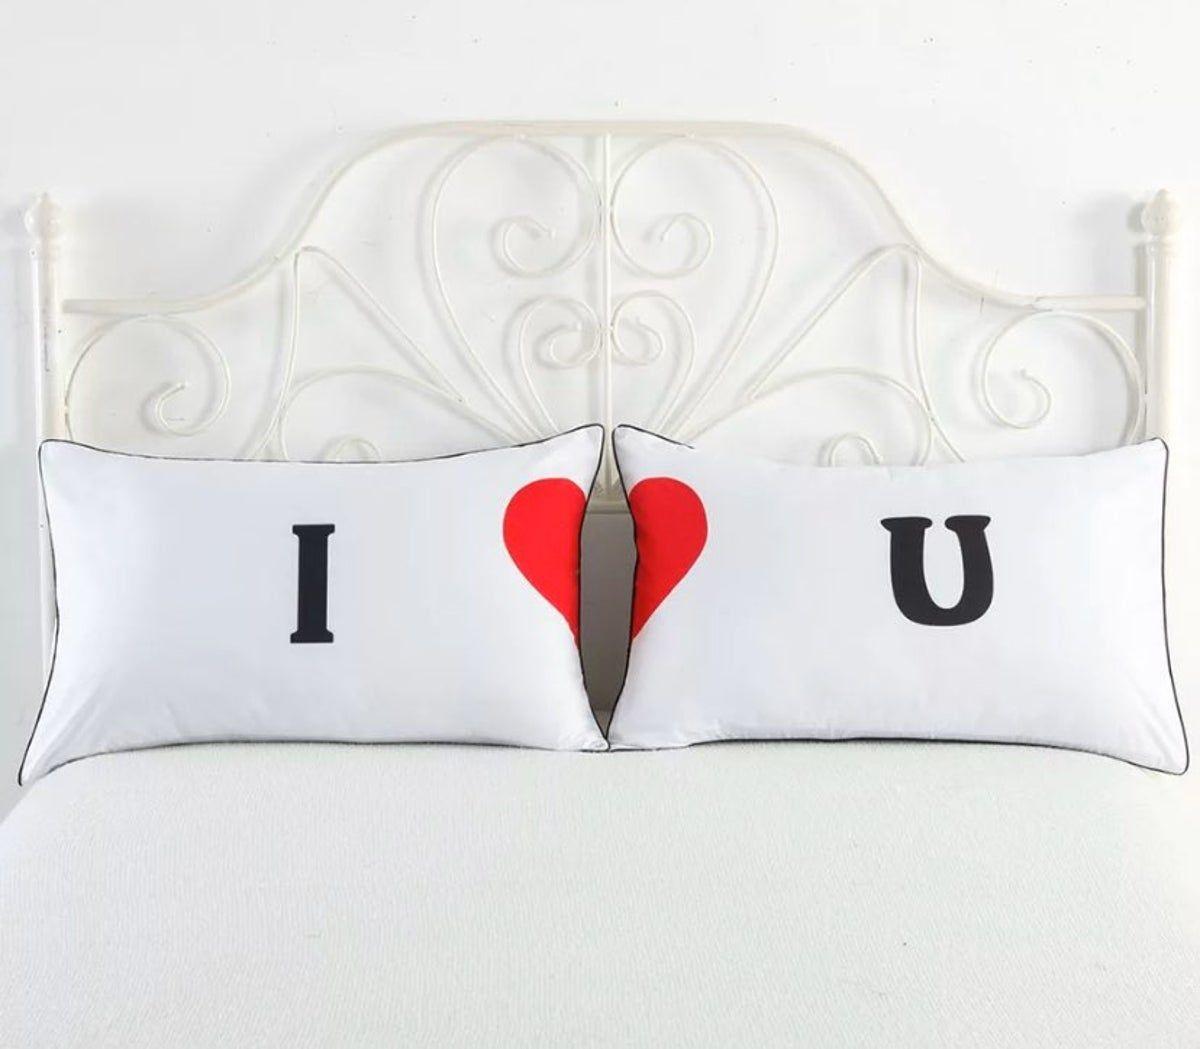 Pin By Bianca Ilias On Regalos Pa Navidad In 2020 Couple Pillow Couple Pillowcase Living Room Decor Pillows #pillowcases #for #living #room